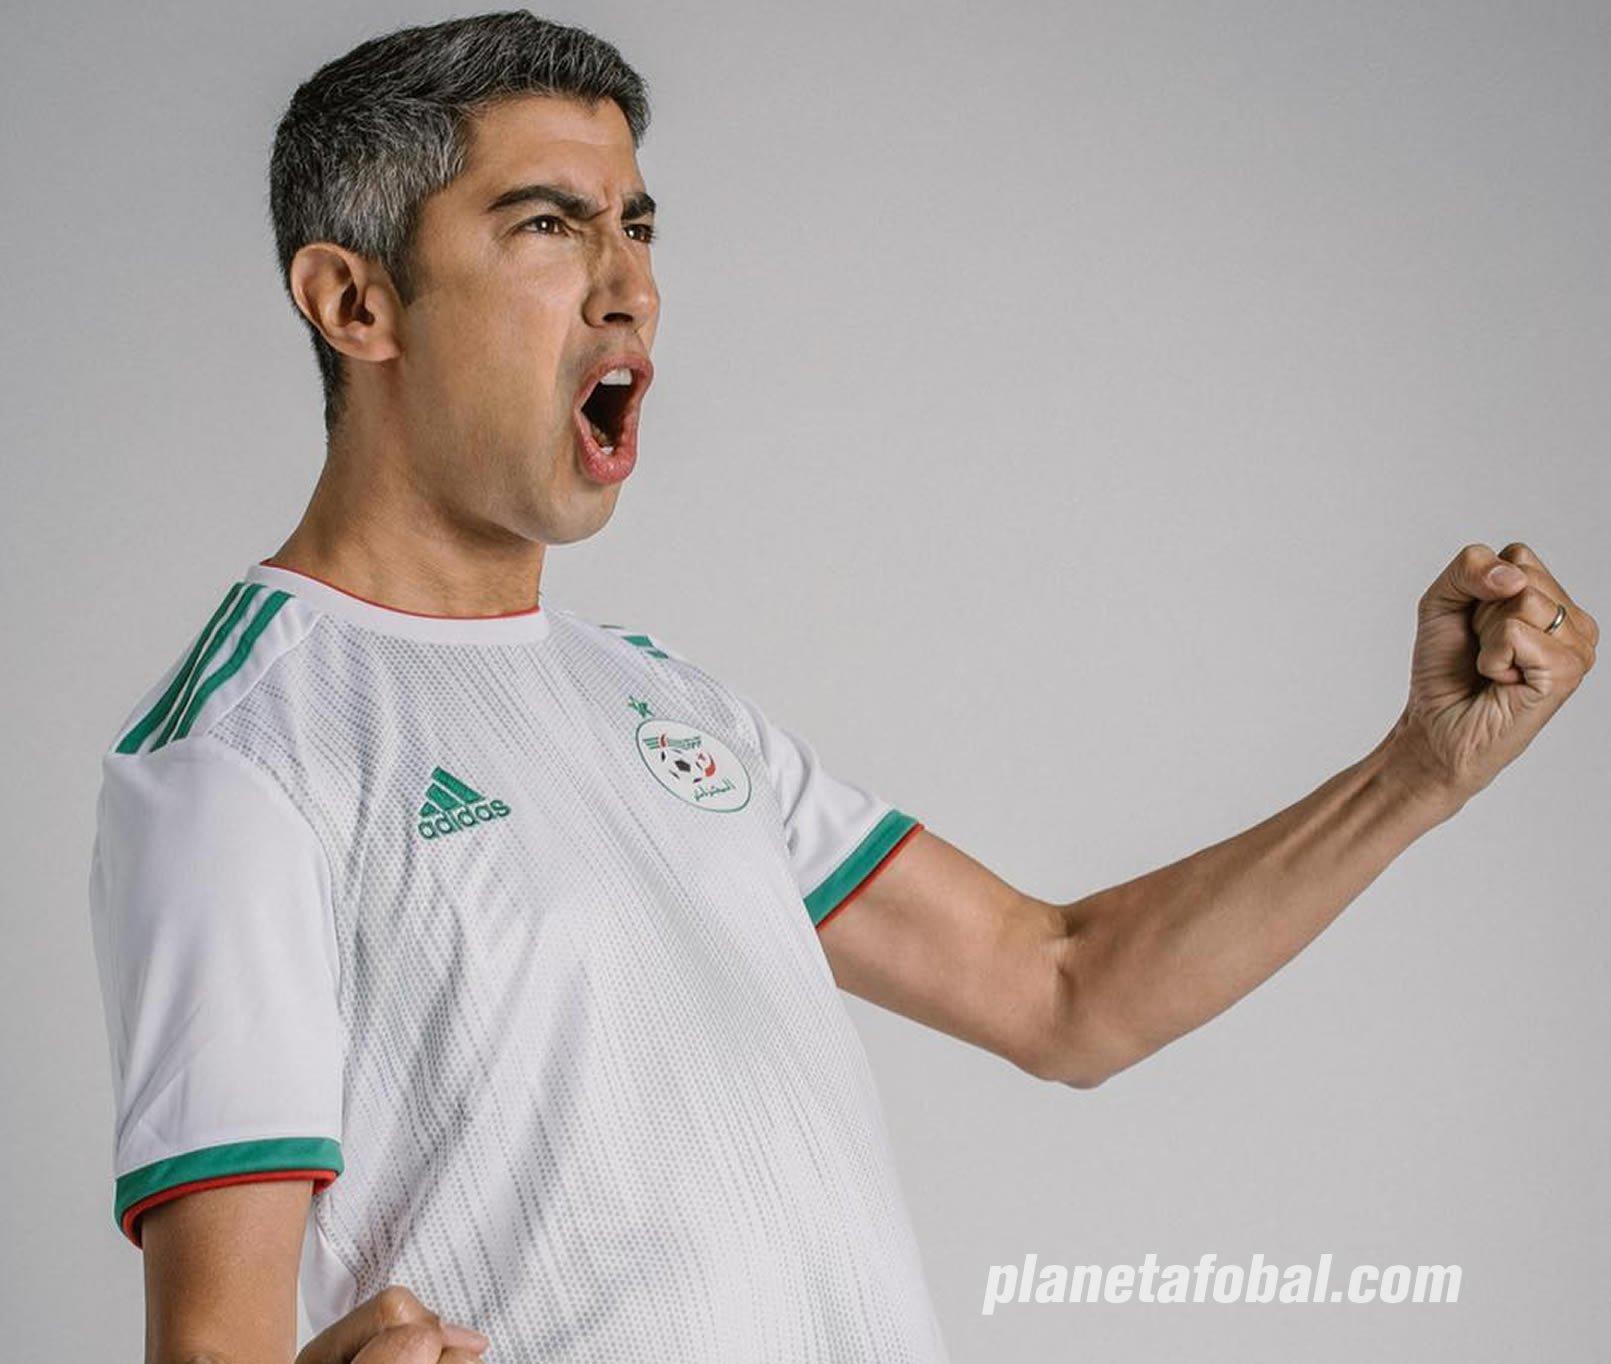 Camisetas Adidas de Argelia 2019 | Imagen Twitter Smaïl Bouabdellah